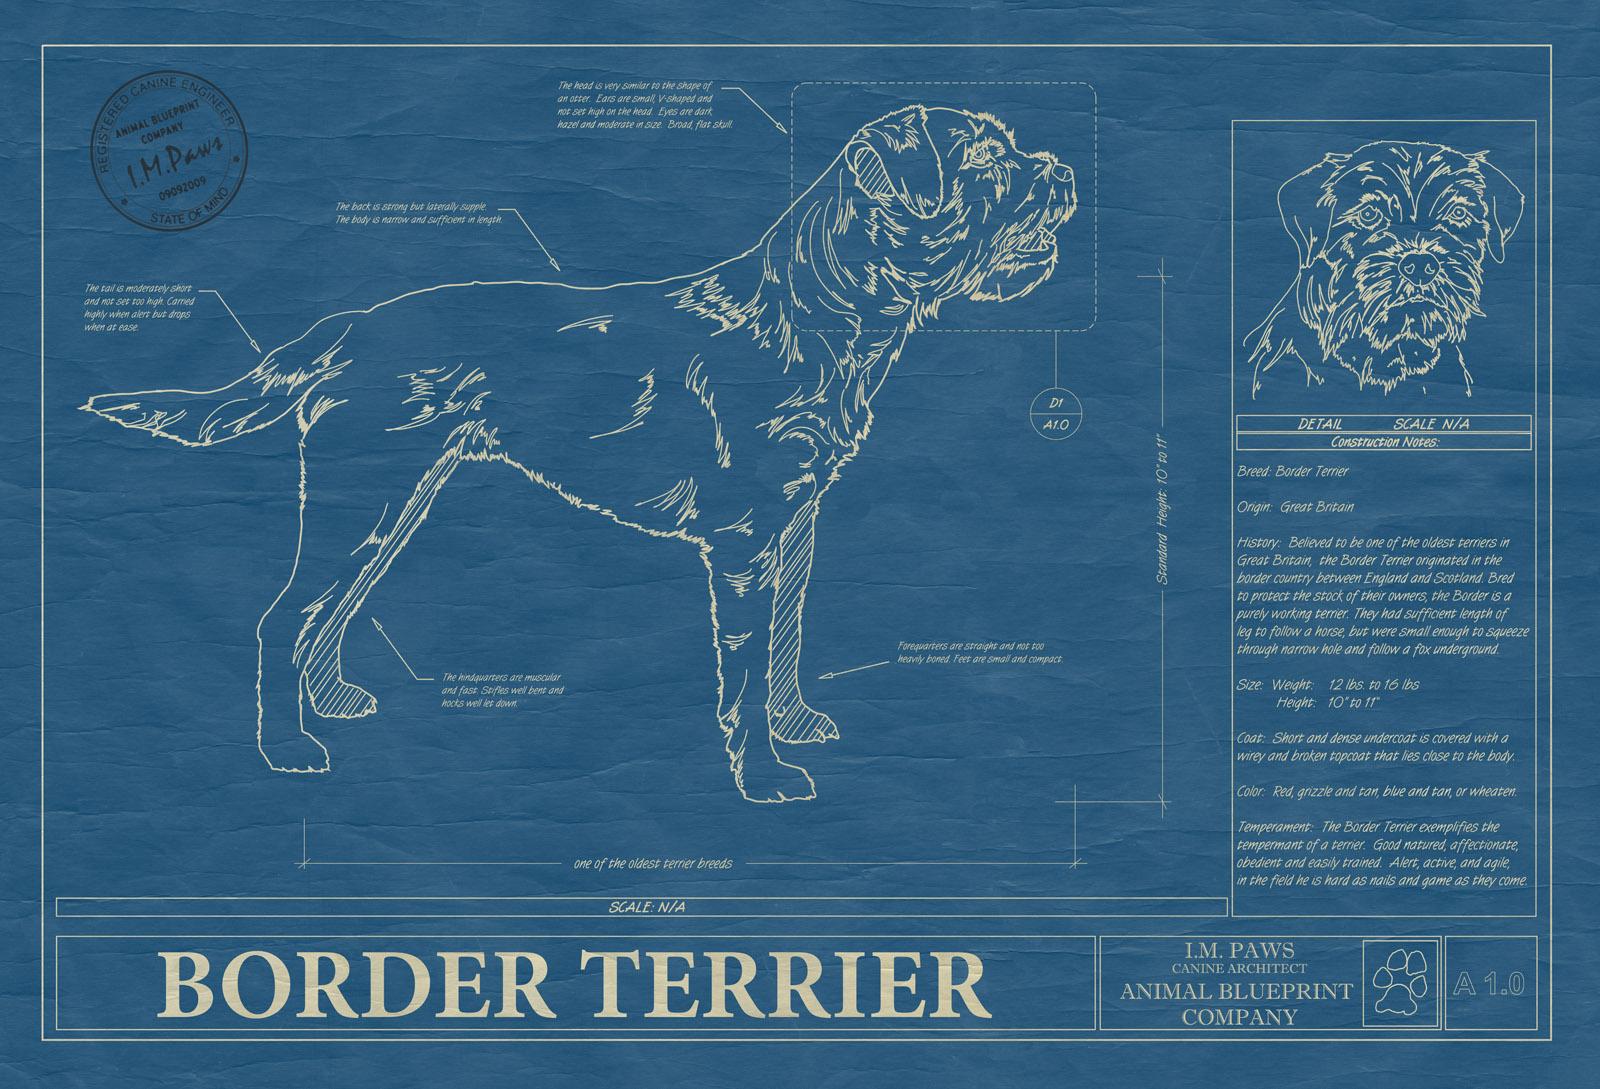 Border terrier animal blueprint company border terrier dog blueprint malvernweather Image collections